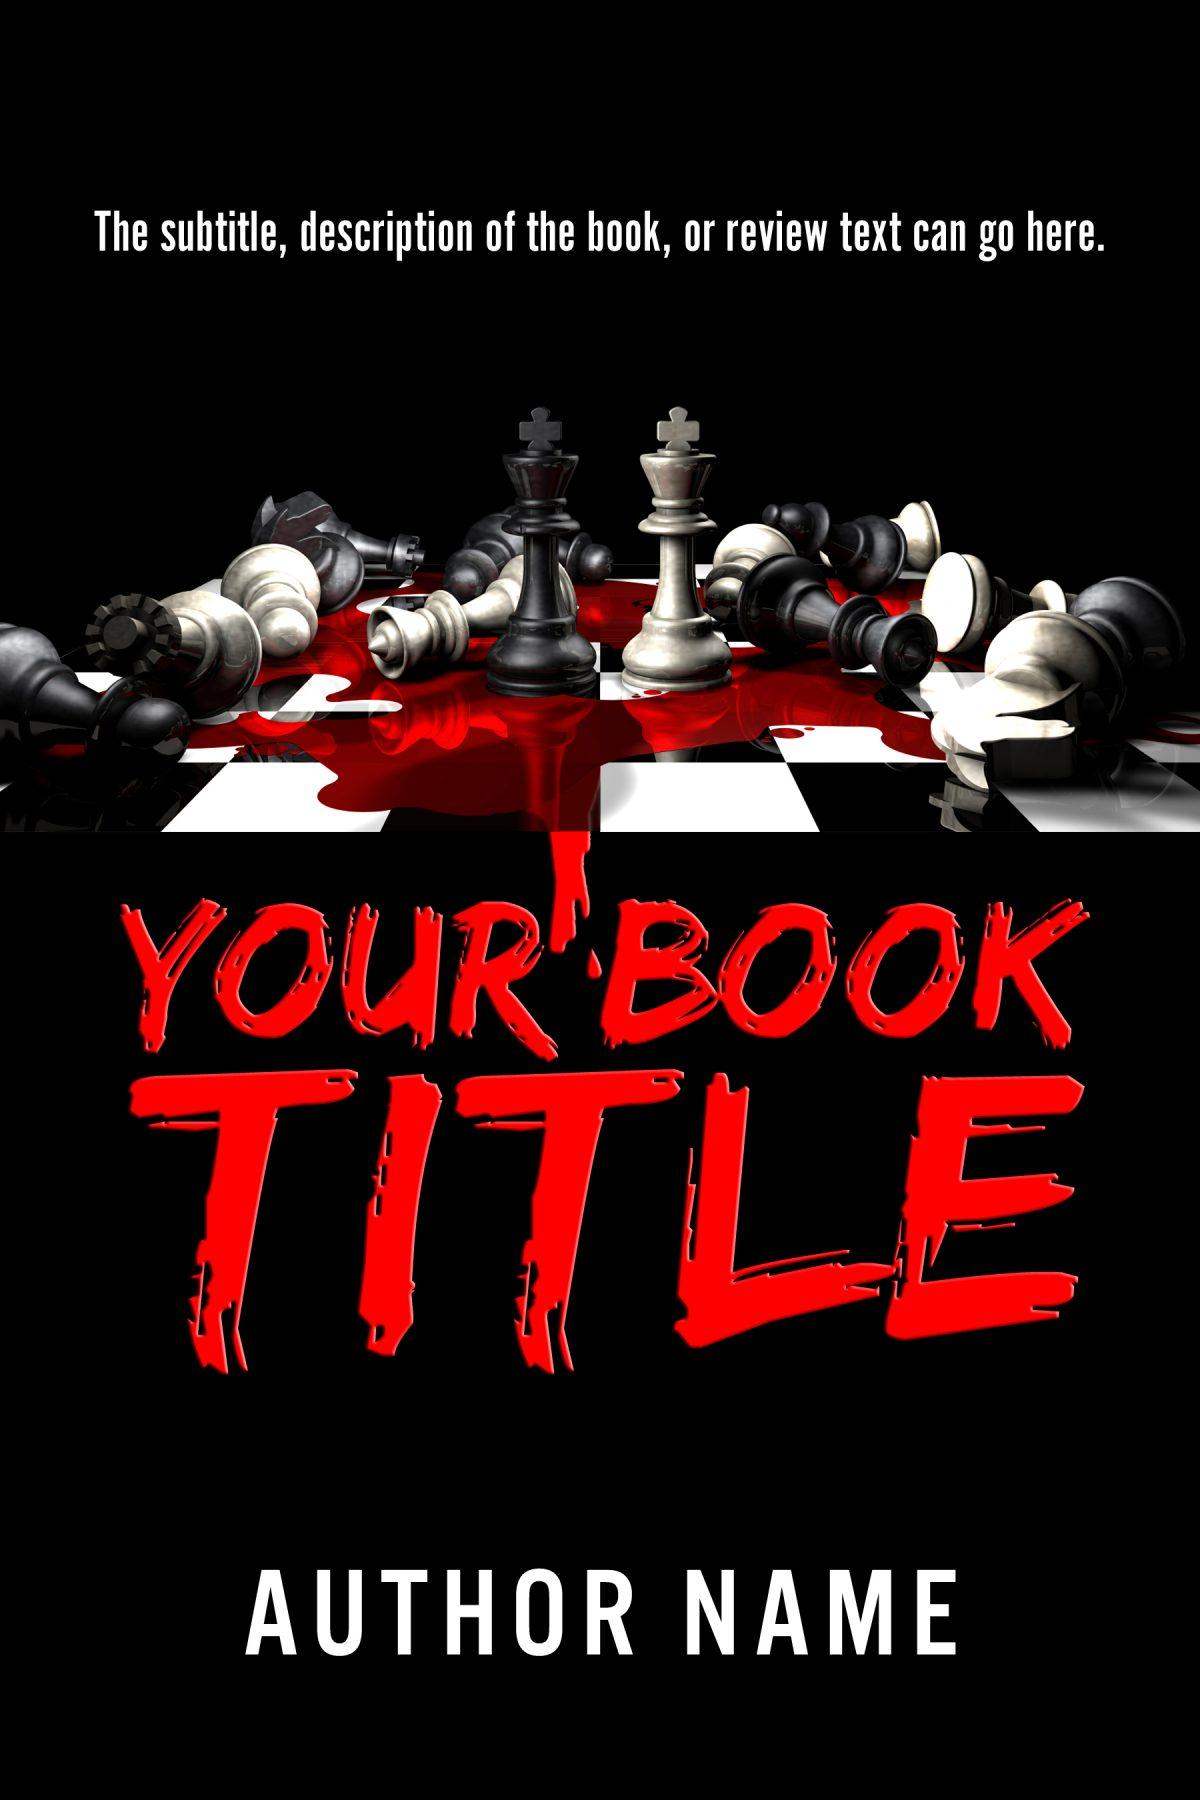 Horror or murder mystery book cover design